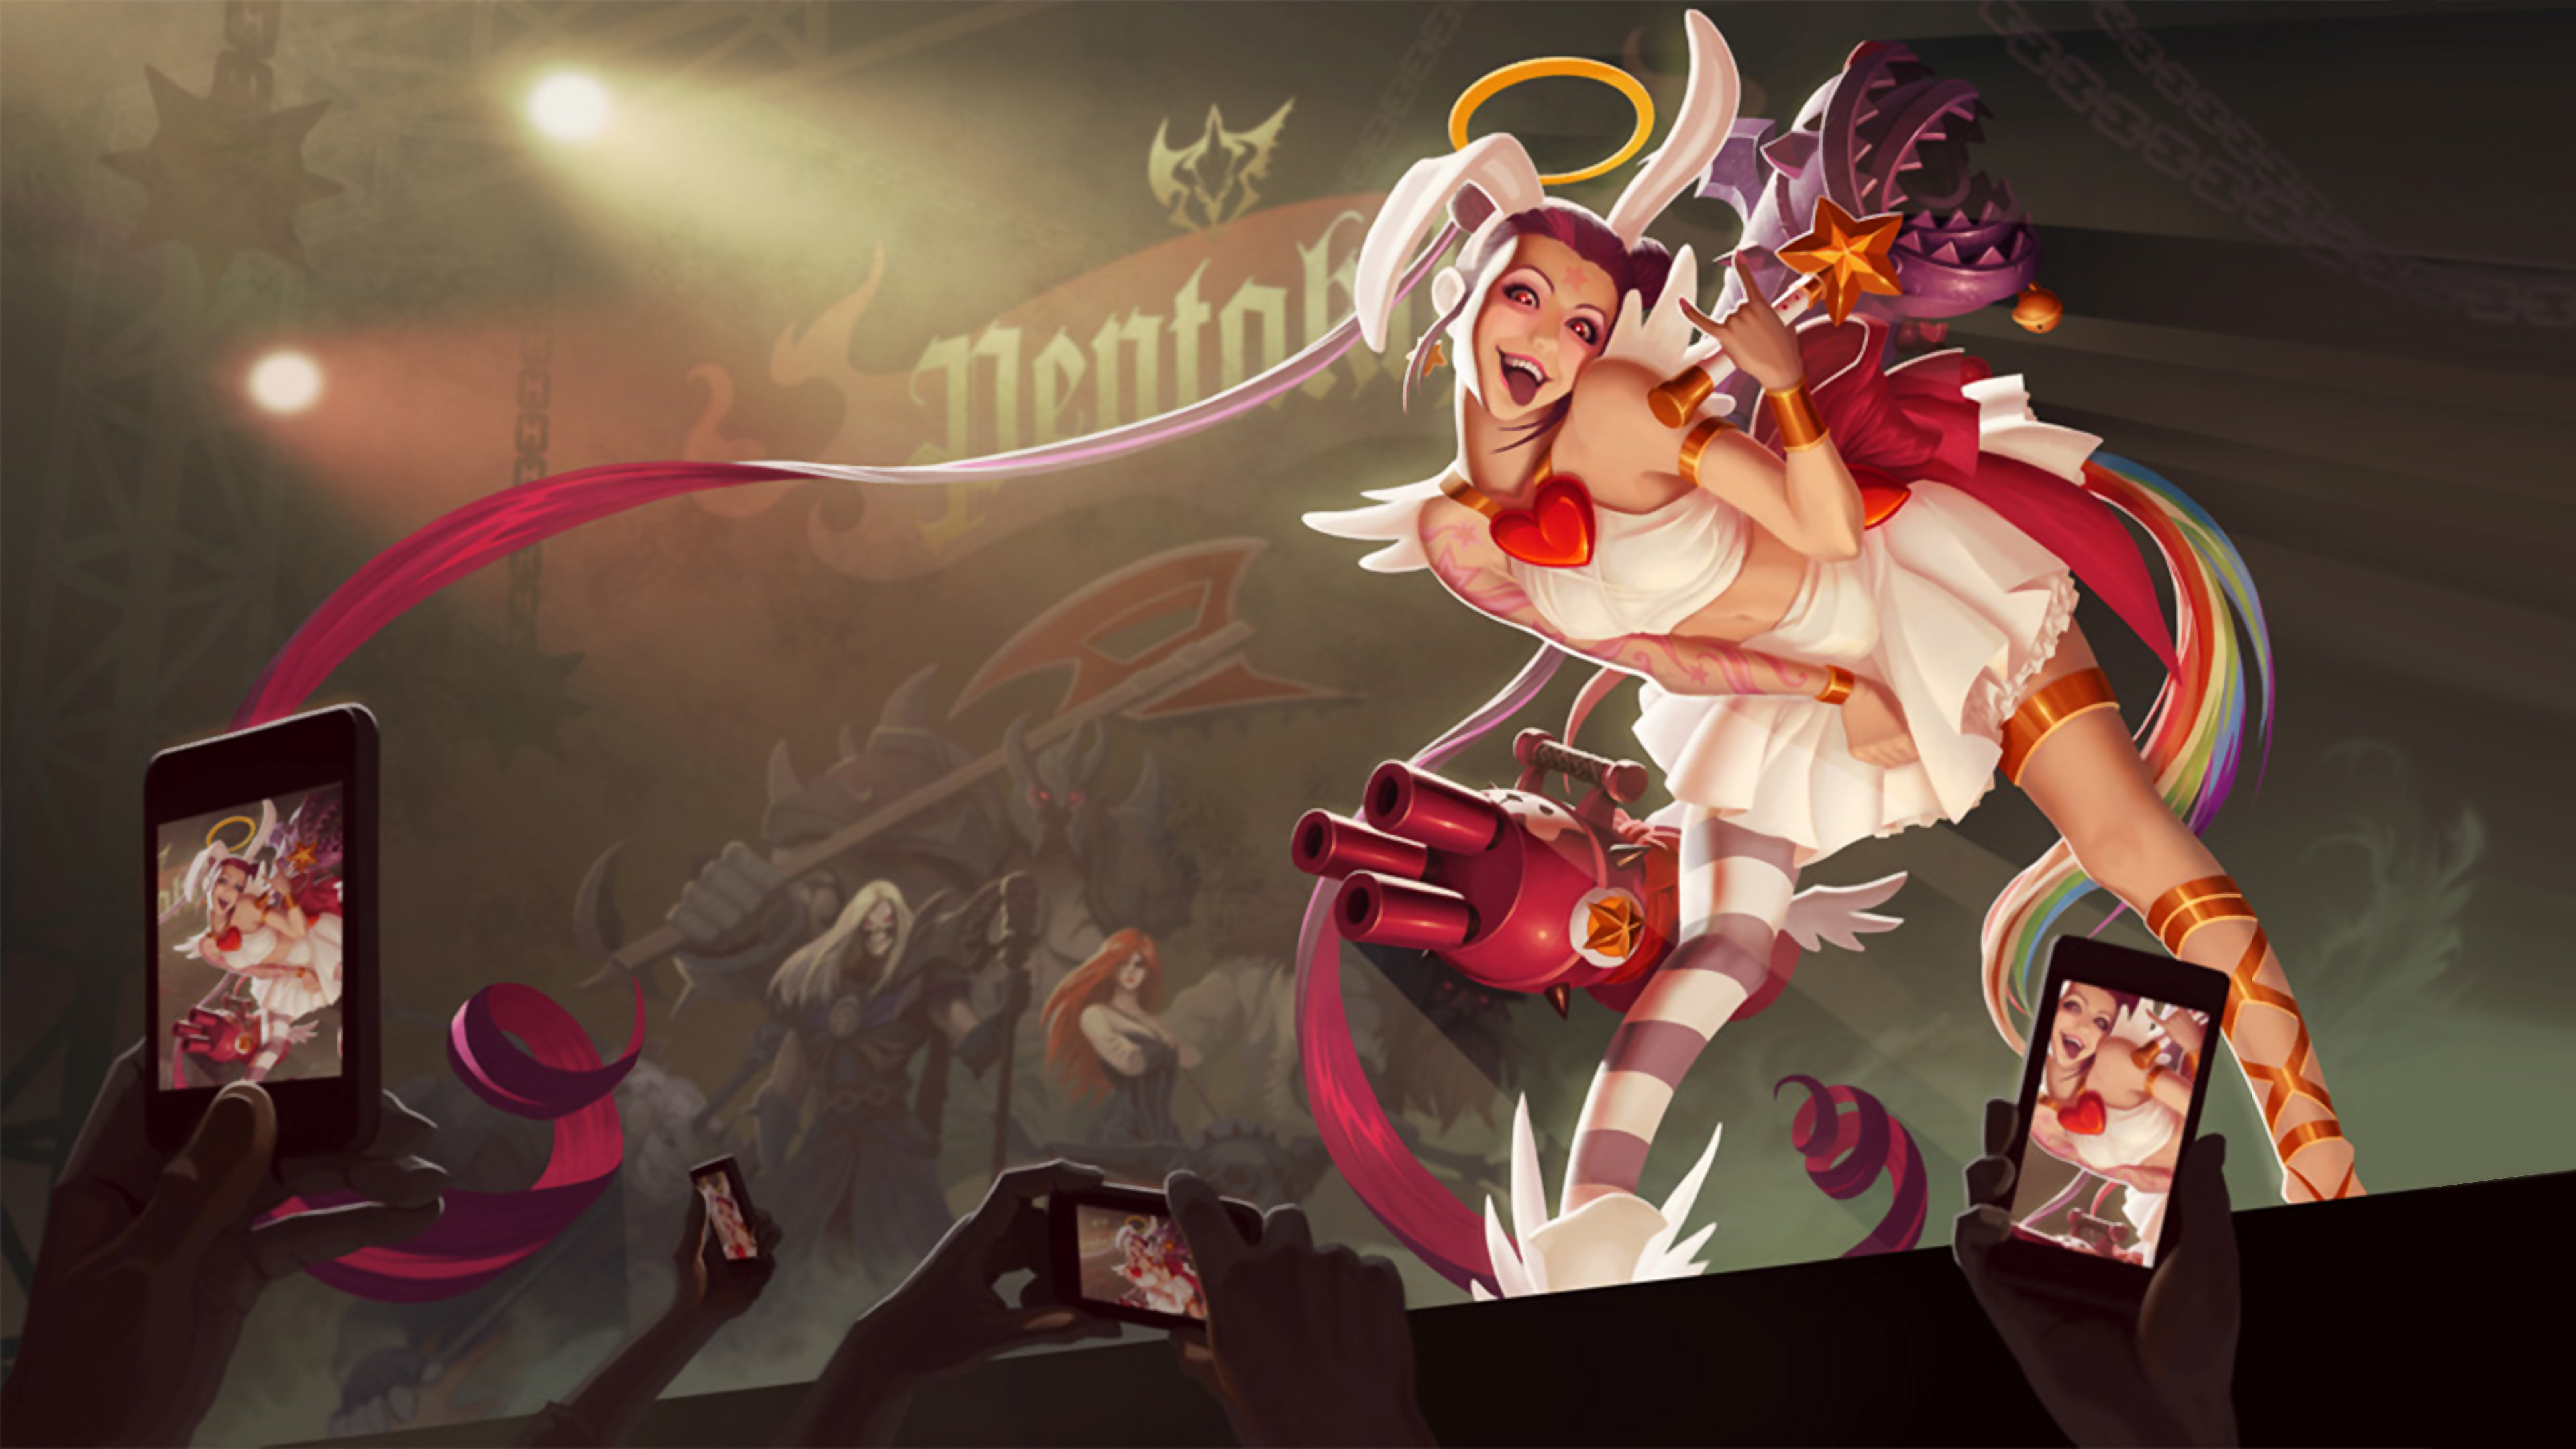 Jinx League Of Legends Wallpapers 3840x2160 Ultra Hd 4k